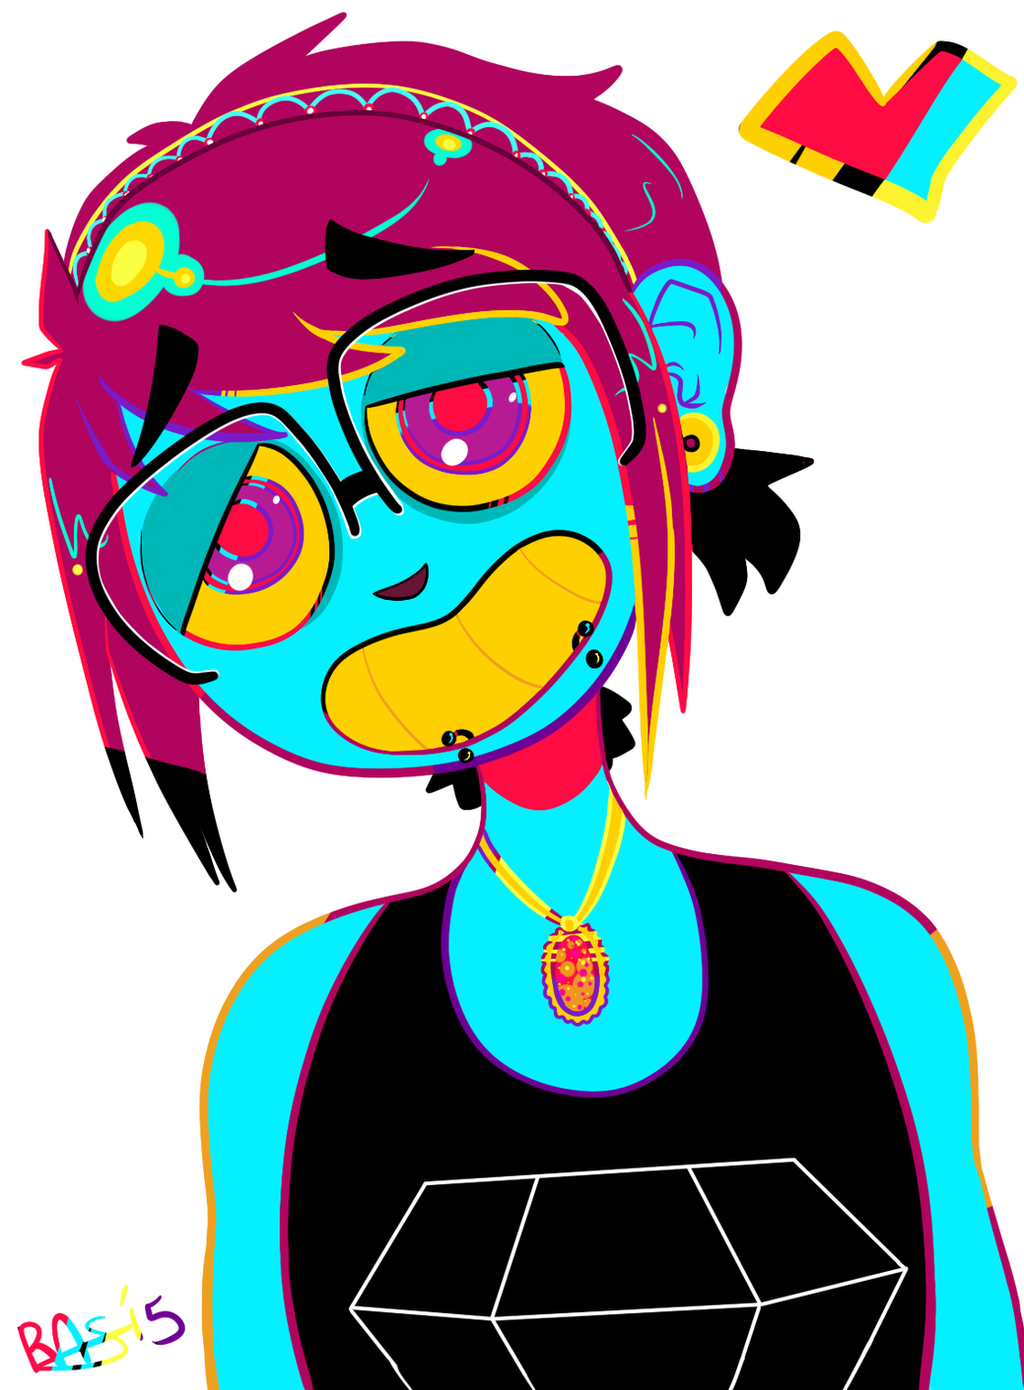 BoneHatter's Profile Picture